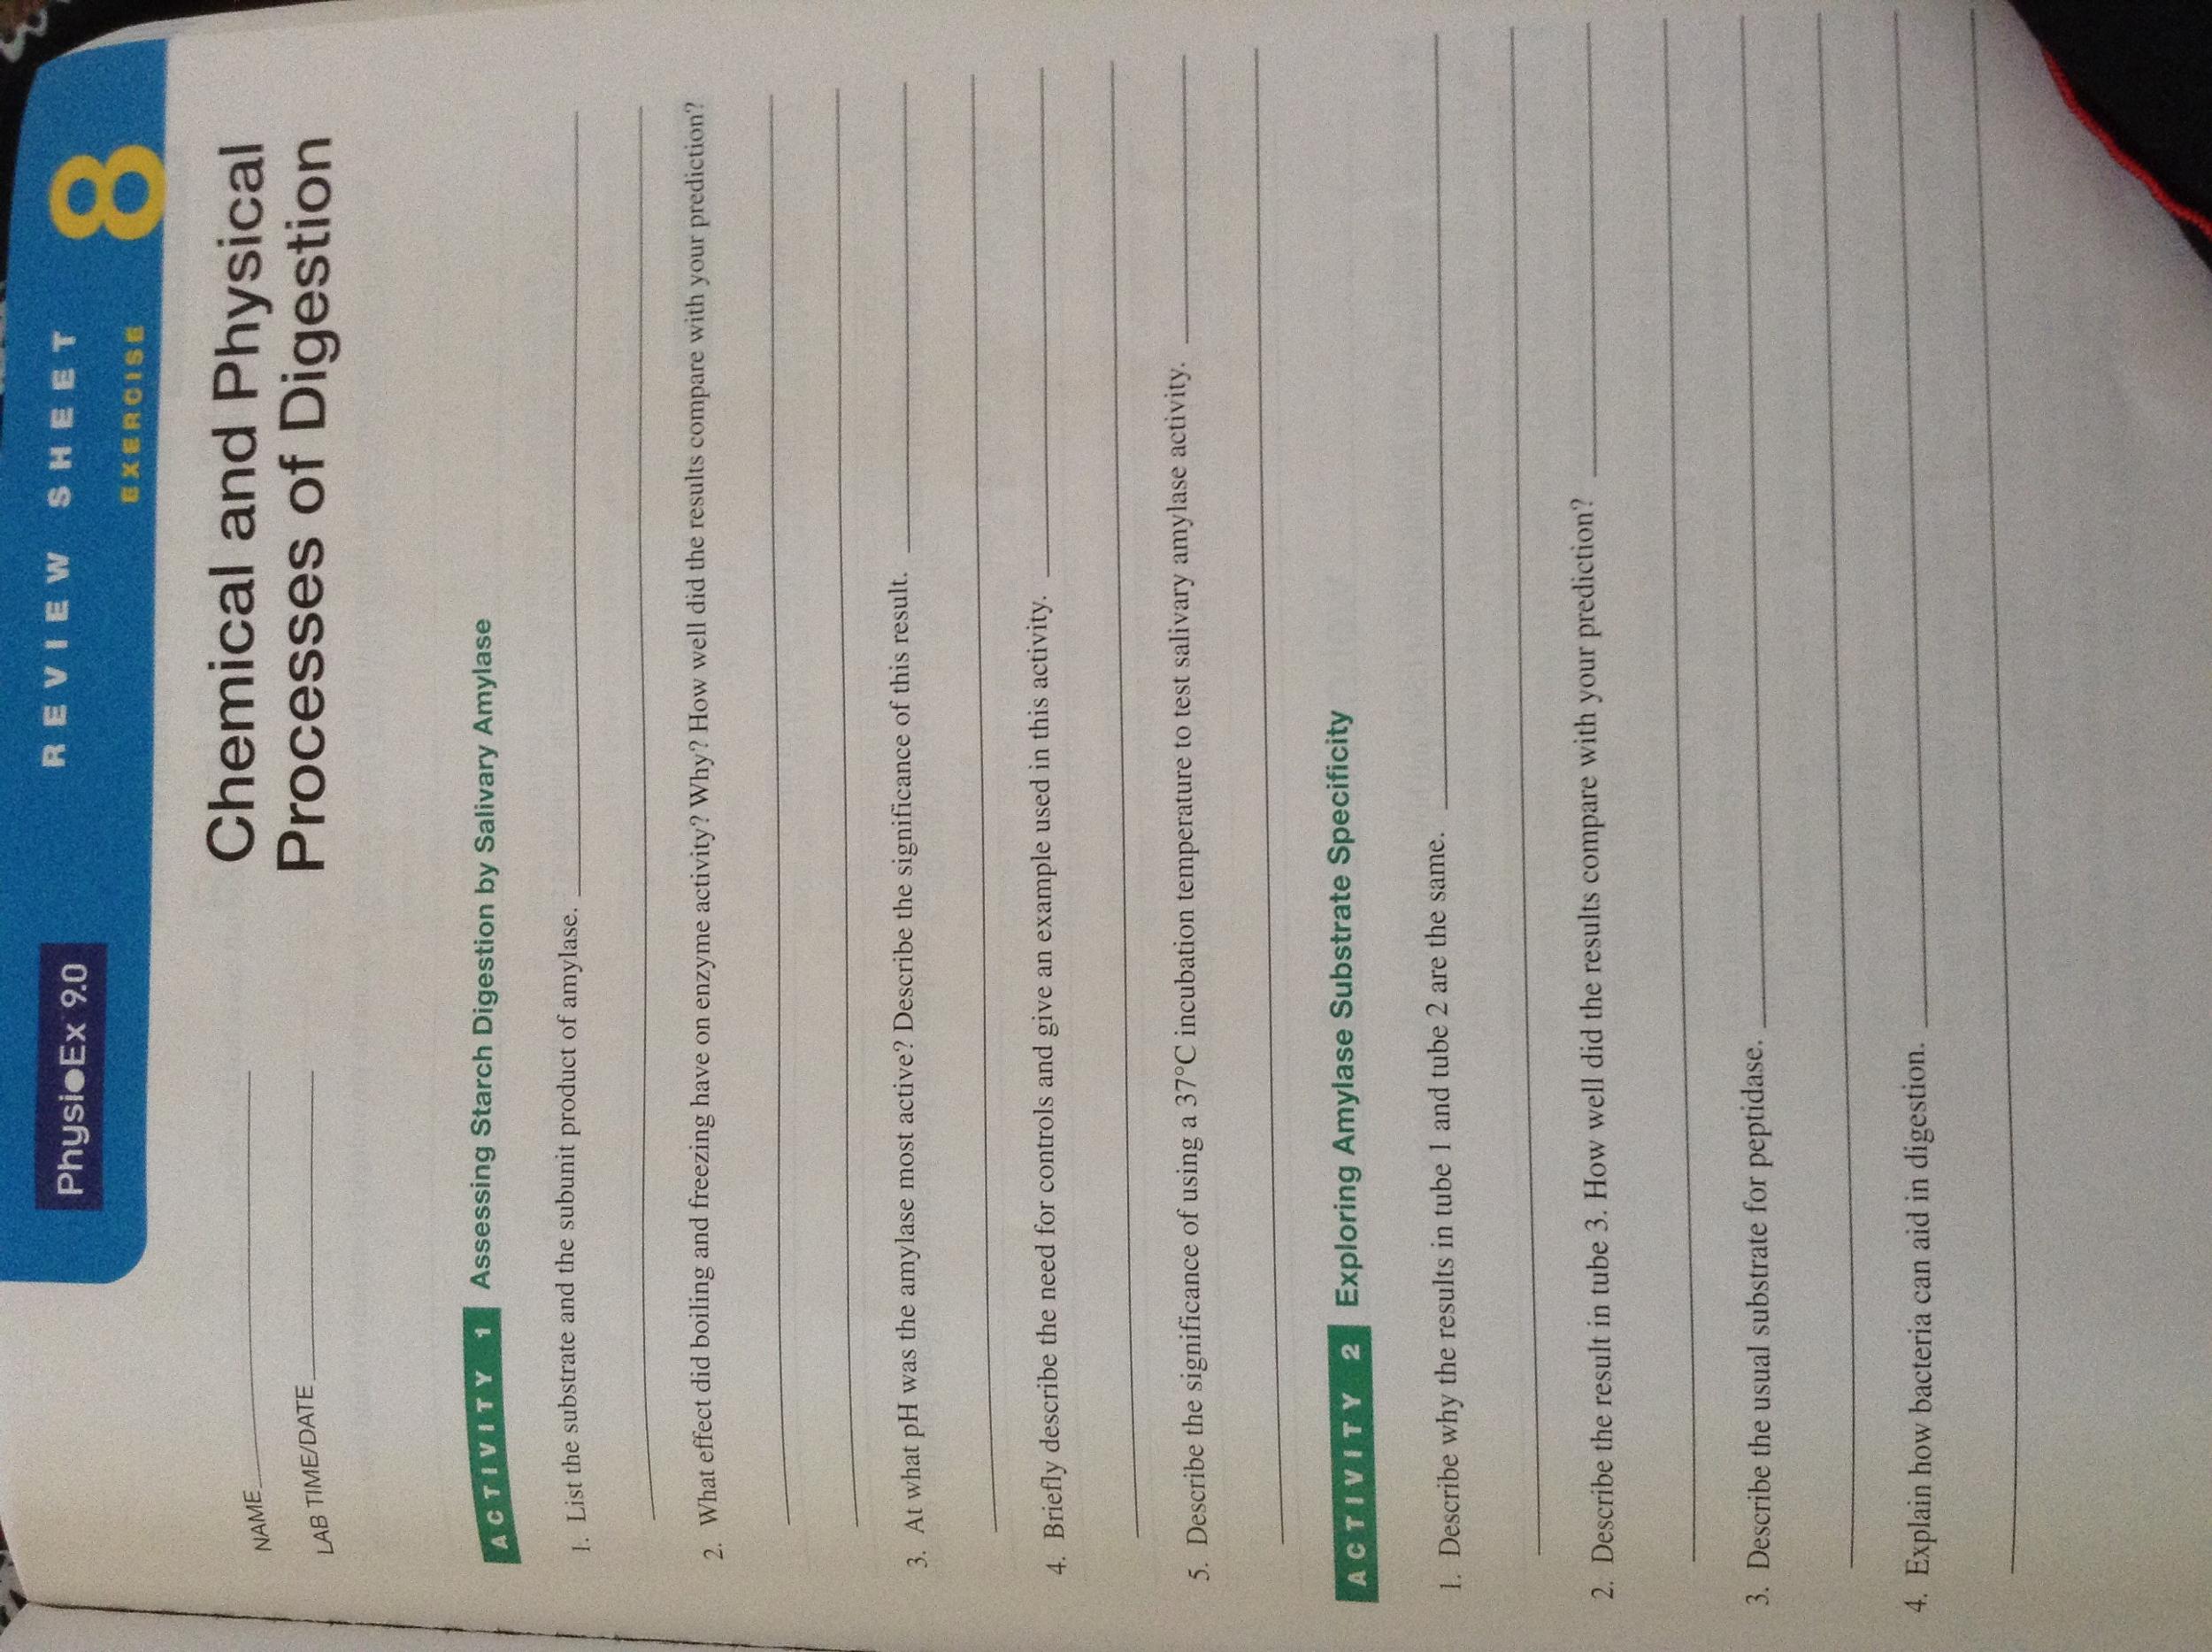 International Journal of Food Science